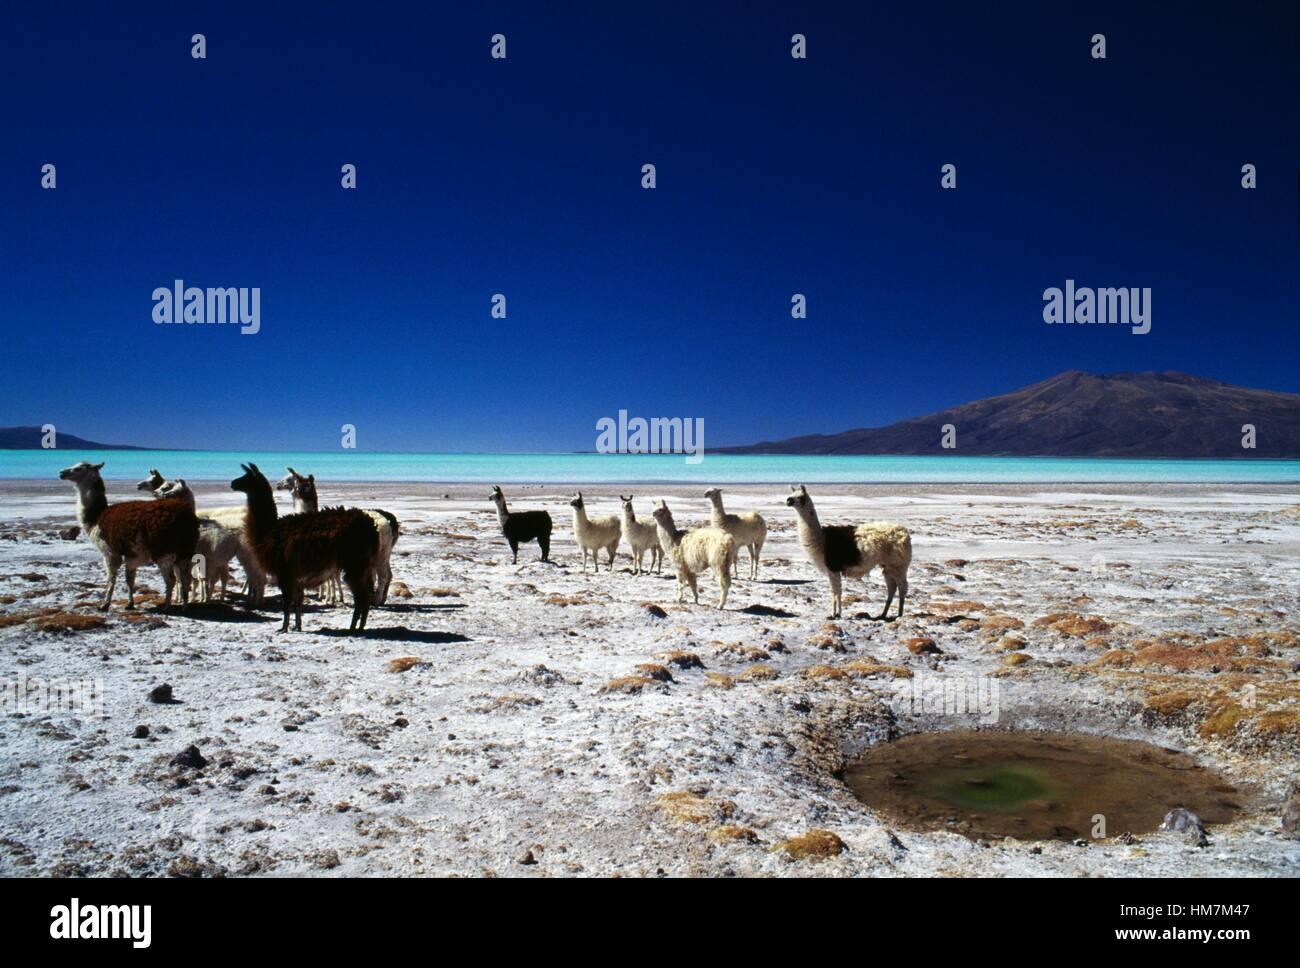 A herd of llamas (Lama glama), Coipasa lake, Bolivia. - Stock Image